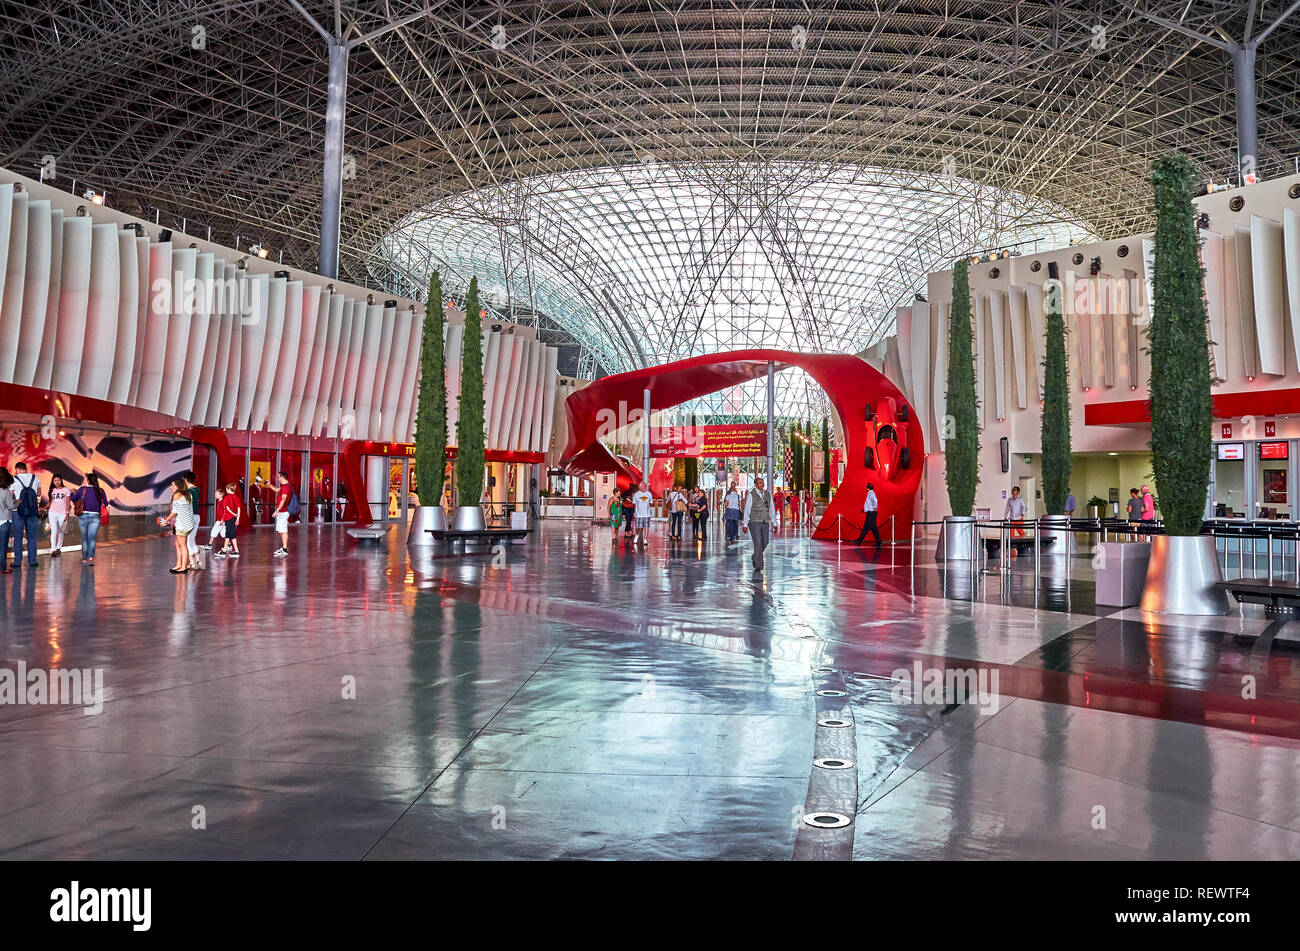 Inside Ferrari World At Yas Island In Abu Dhabi In The United Arad Emirates Ferrari World Is The Largest Indoor Amusement Park In The World Stock Photo Alamy